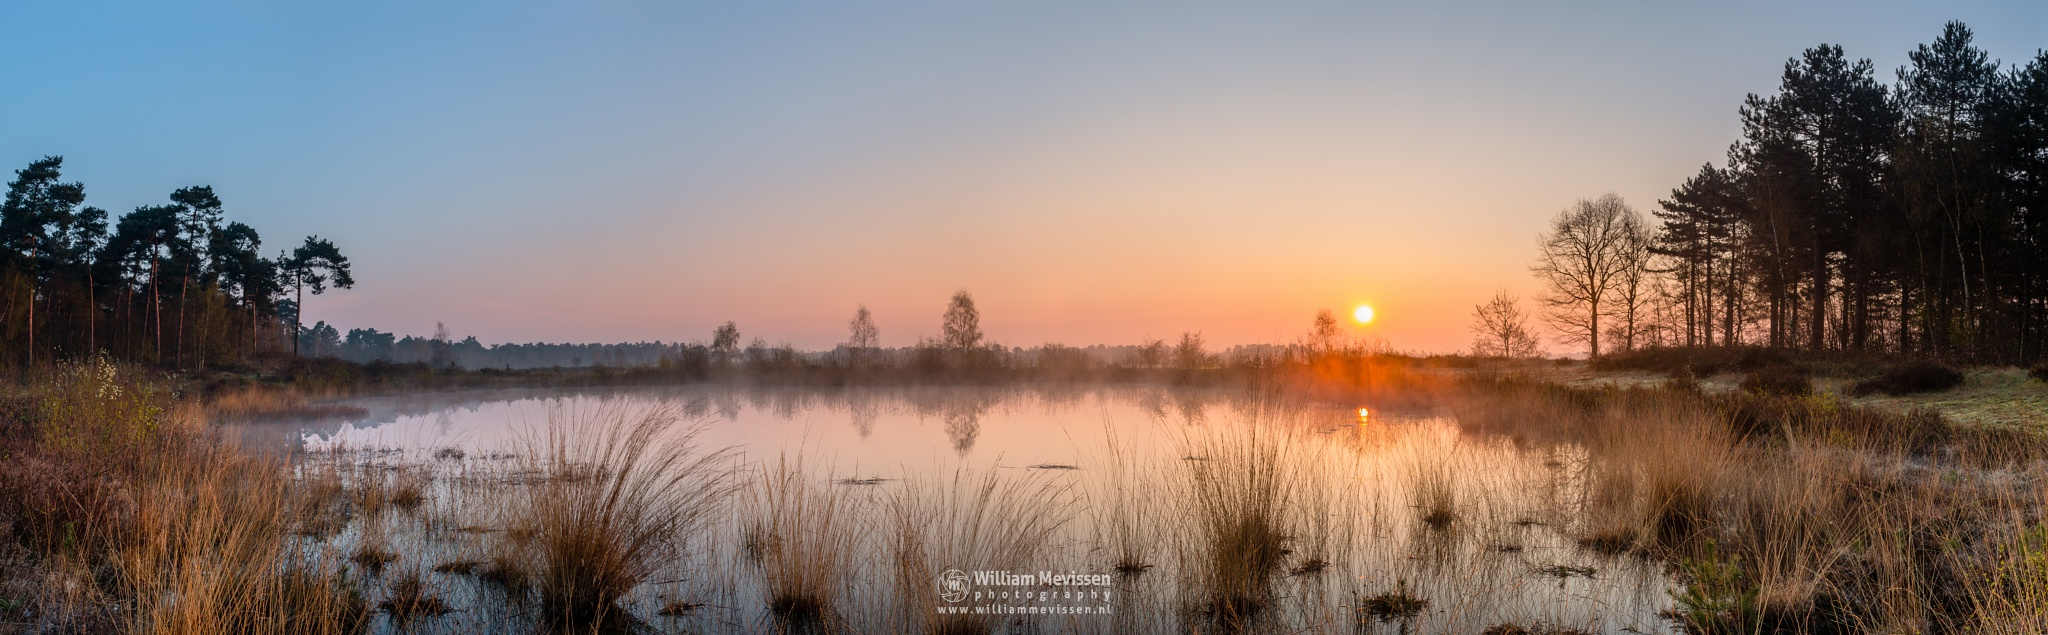 Panorama 'Misty Sunrise Fen' by William Mevissen